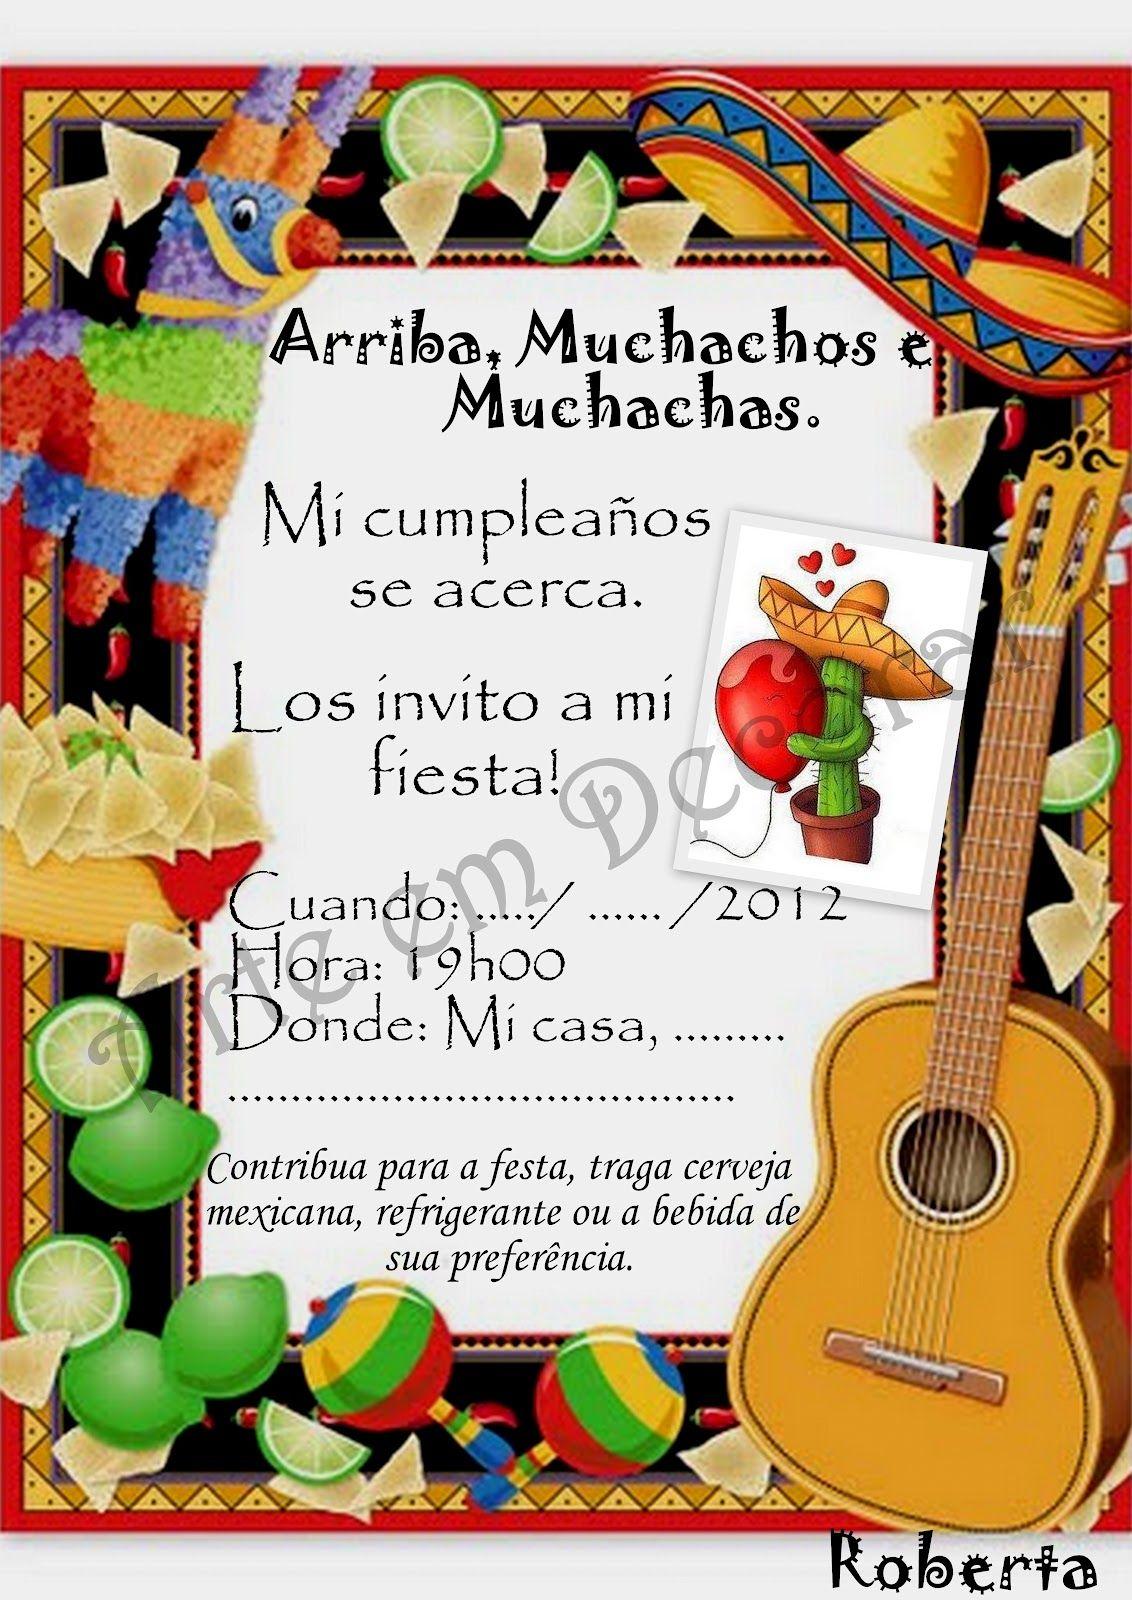 convite para festa mexicana - Pesquisa Google  941491d102f